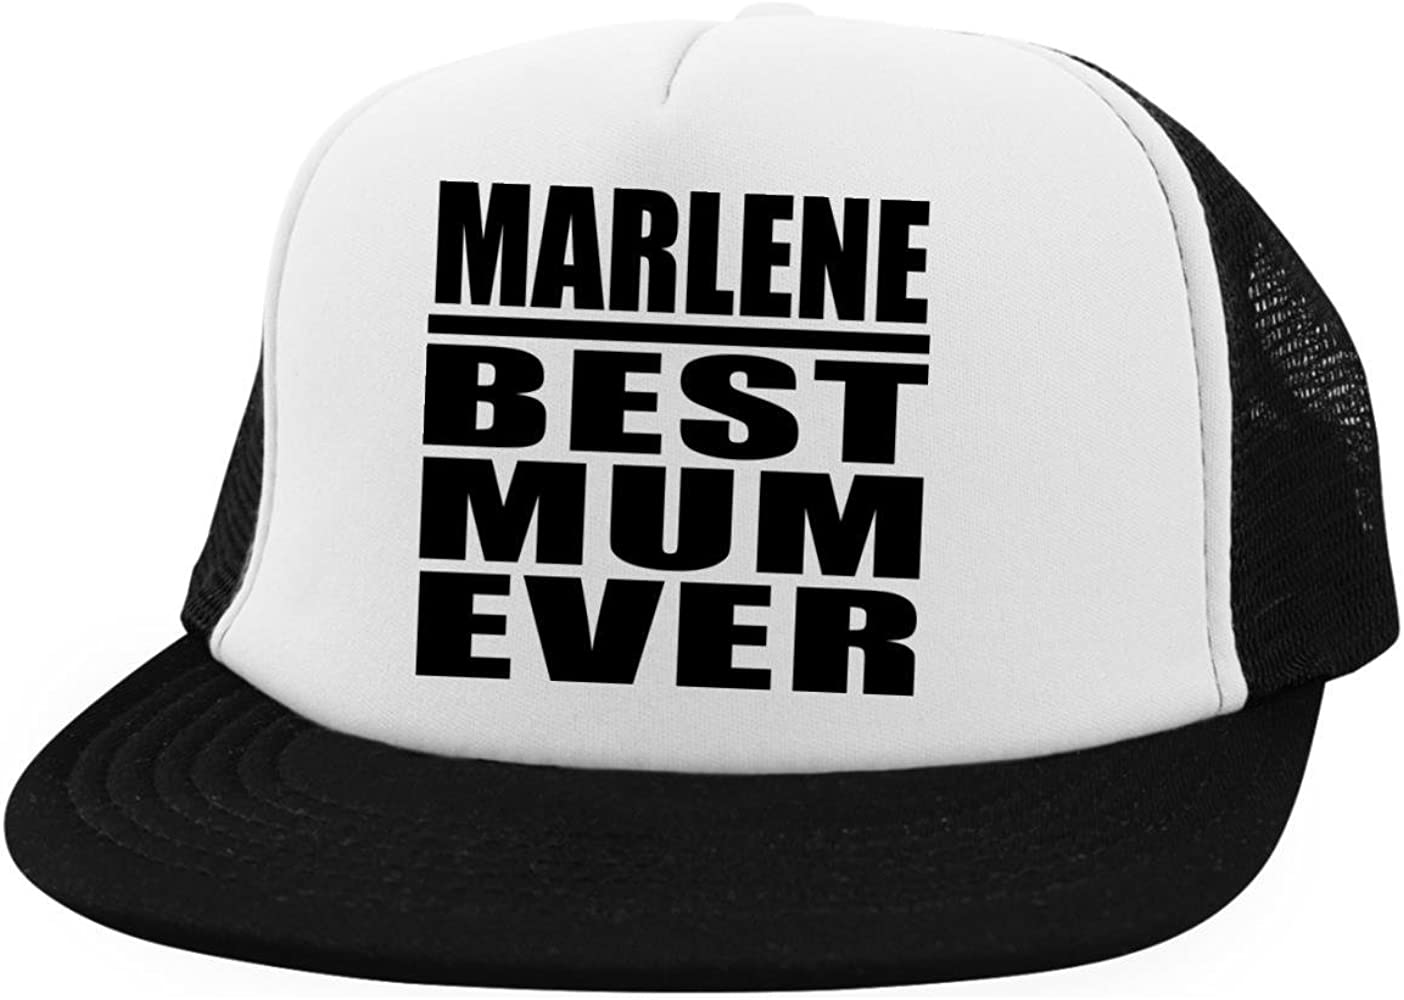 Designsify Marlene Best Mum Ever - Trucker Hat Visera, Gorra de ...